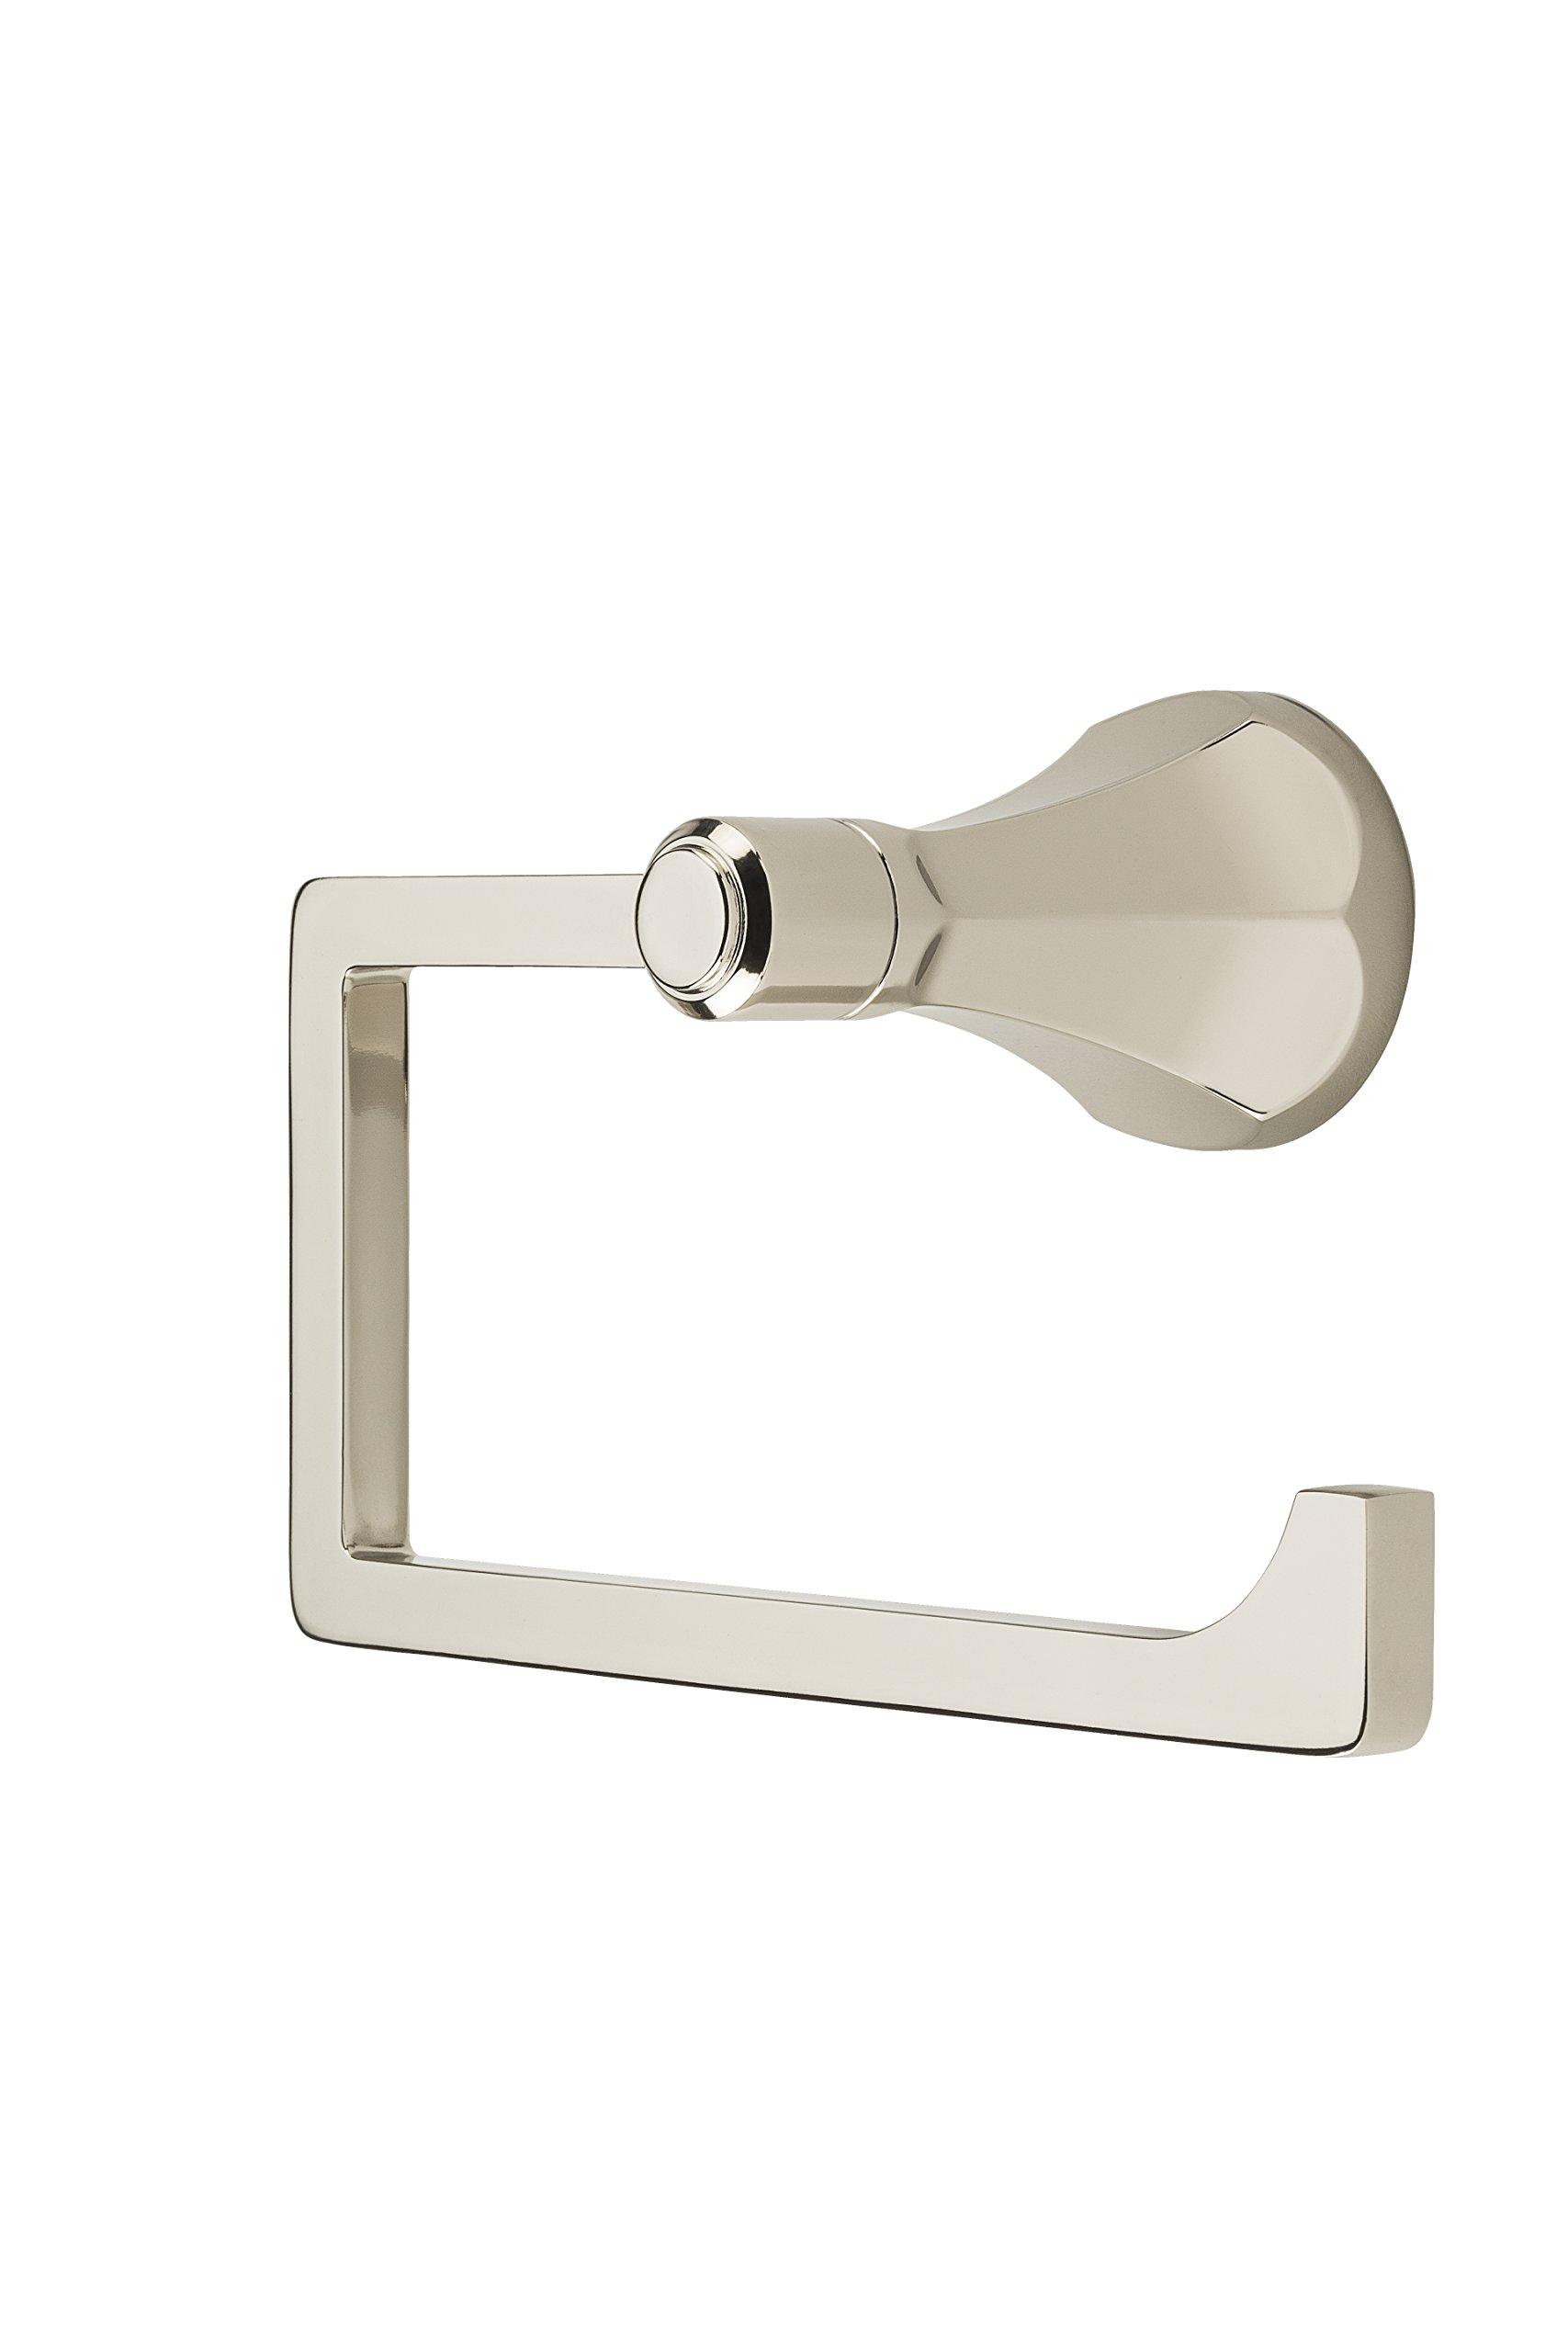 Pfister Arterra Towel Ring, Polished Nickel